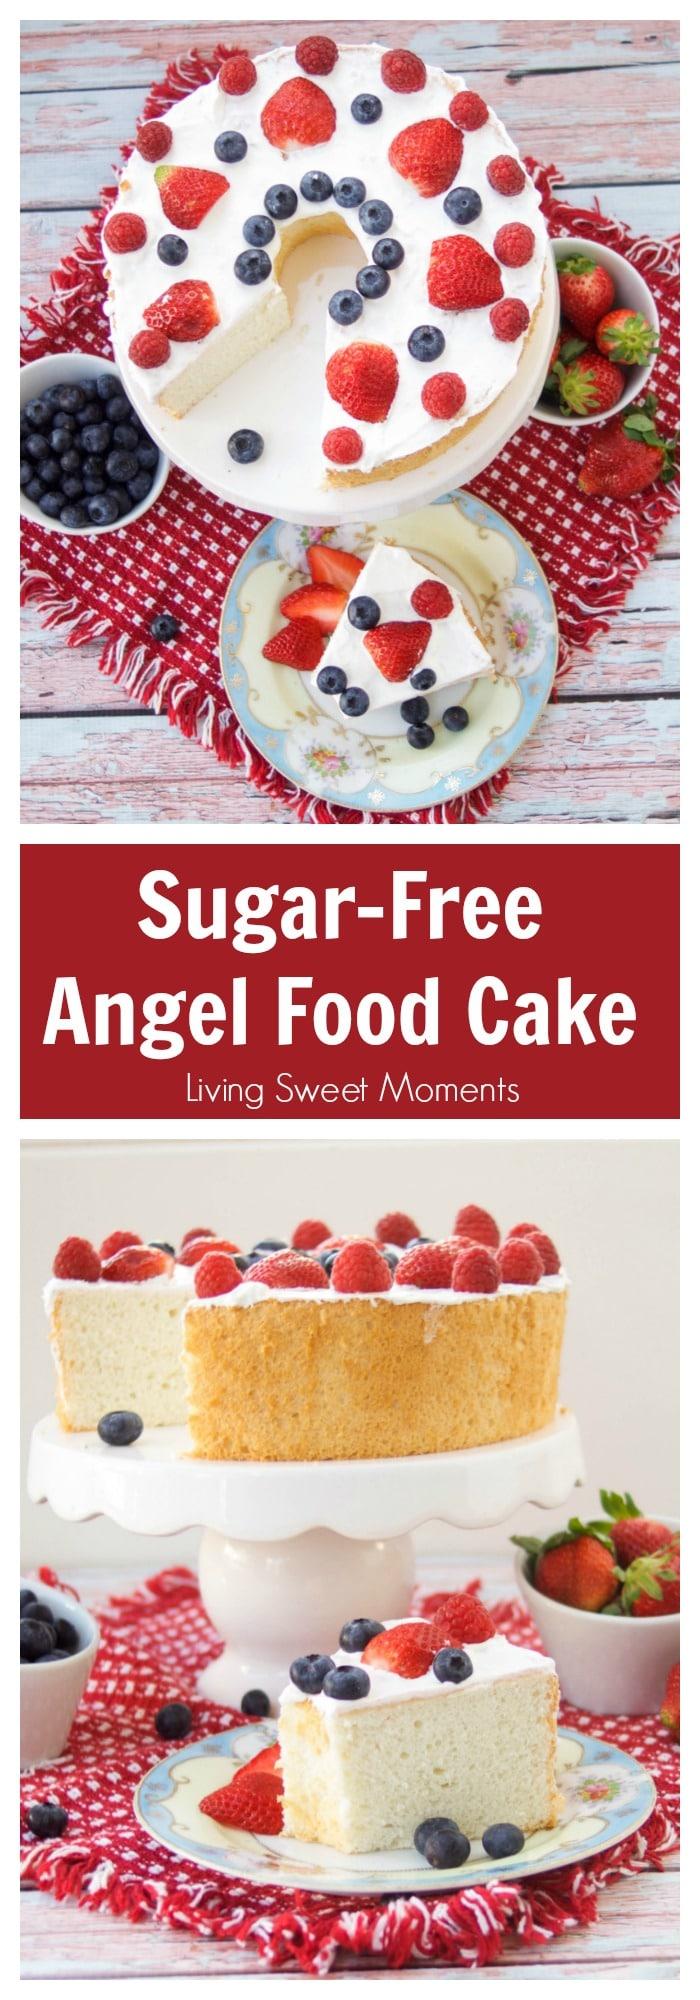 Sugar Free Dress: Incredibly Delicious Sugar Free Angel Food Cake